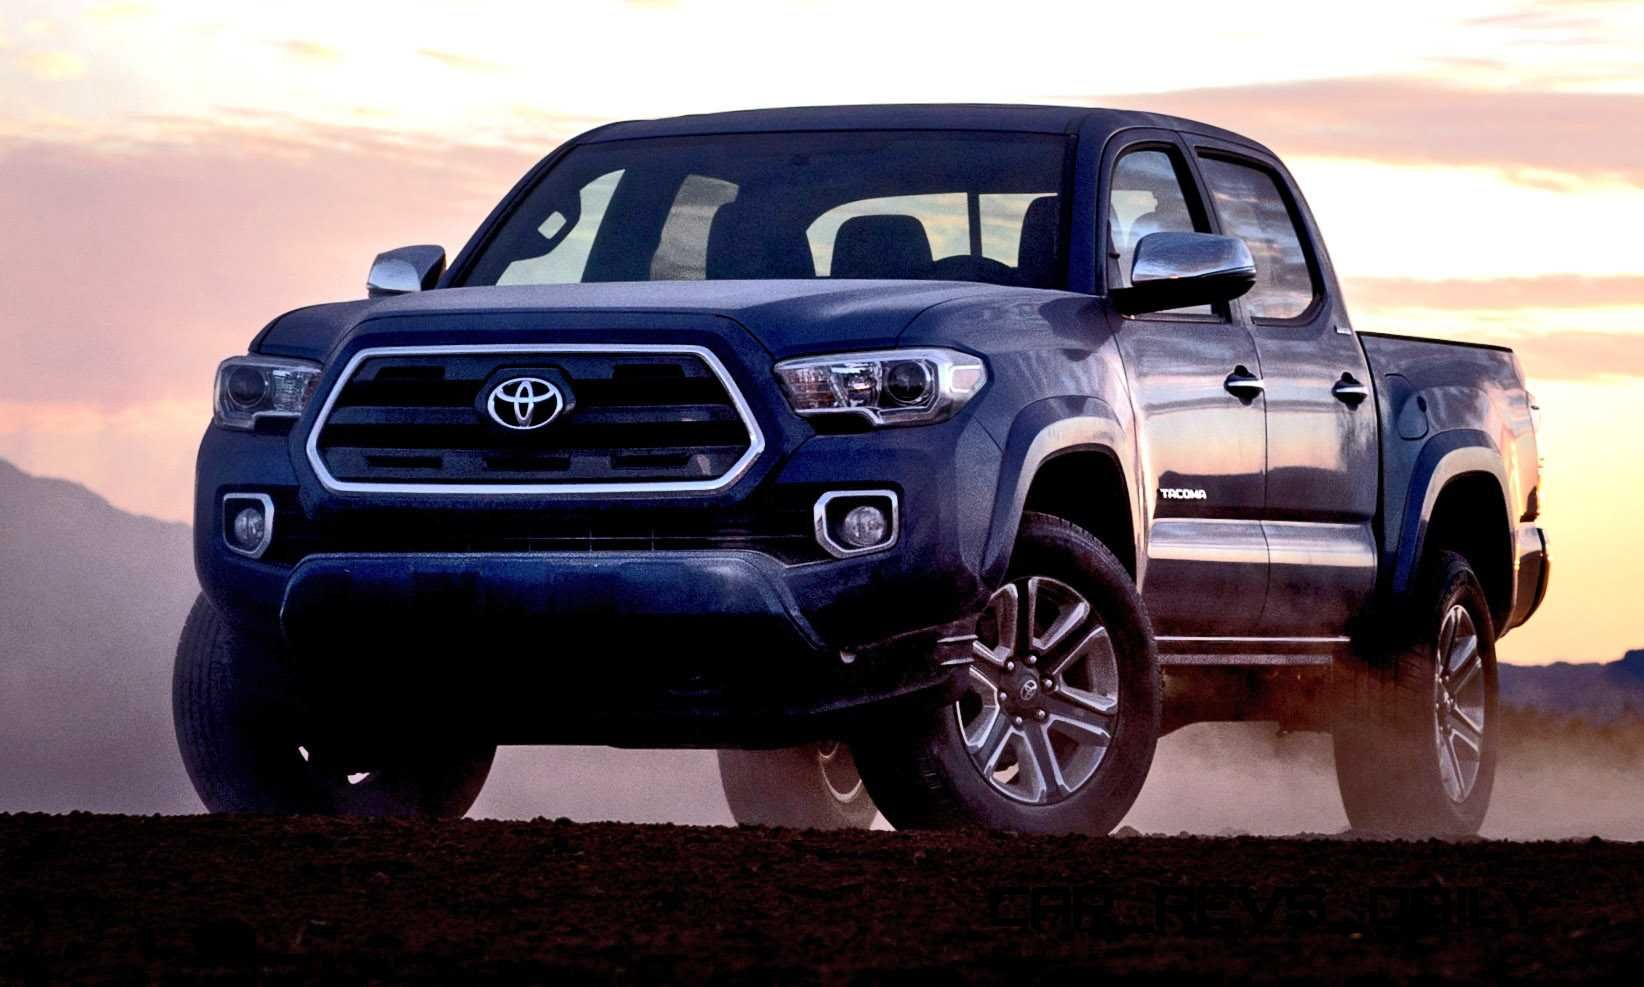 Pin by Junk Bin on Toyota Toyota trucks